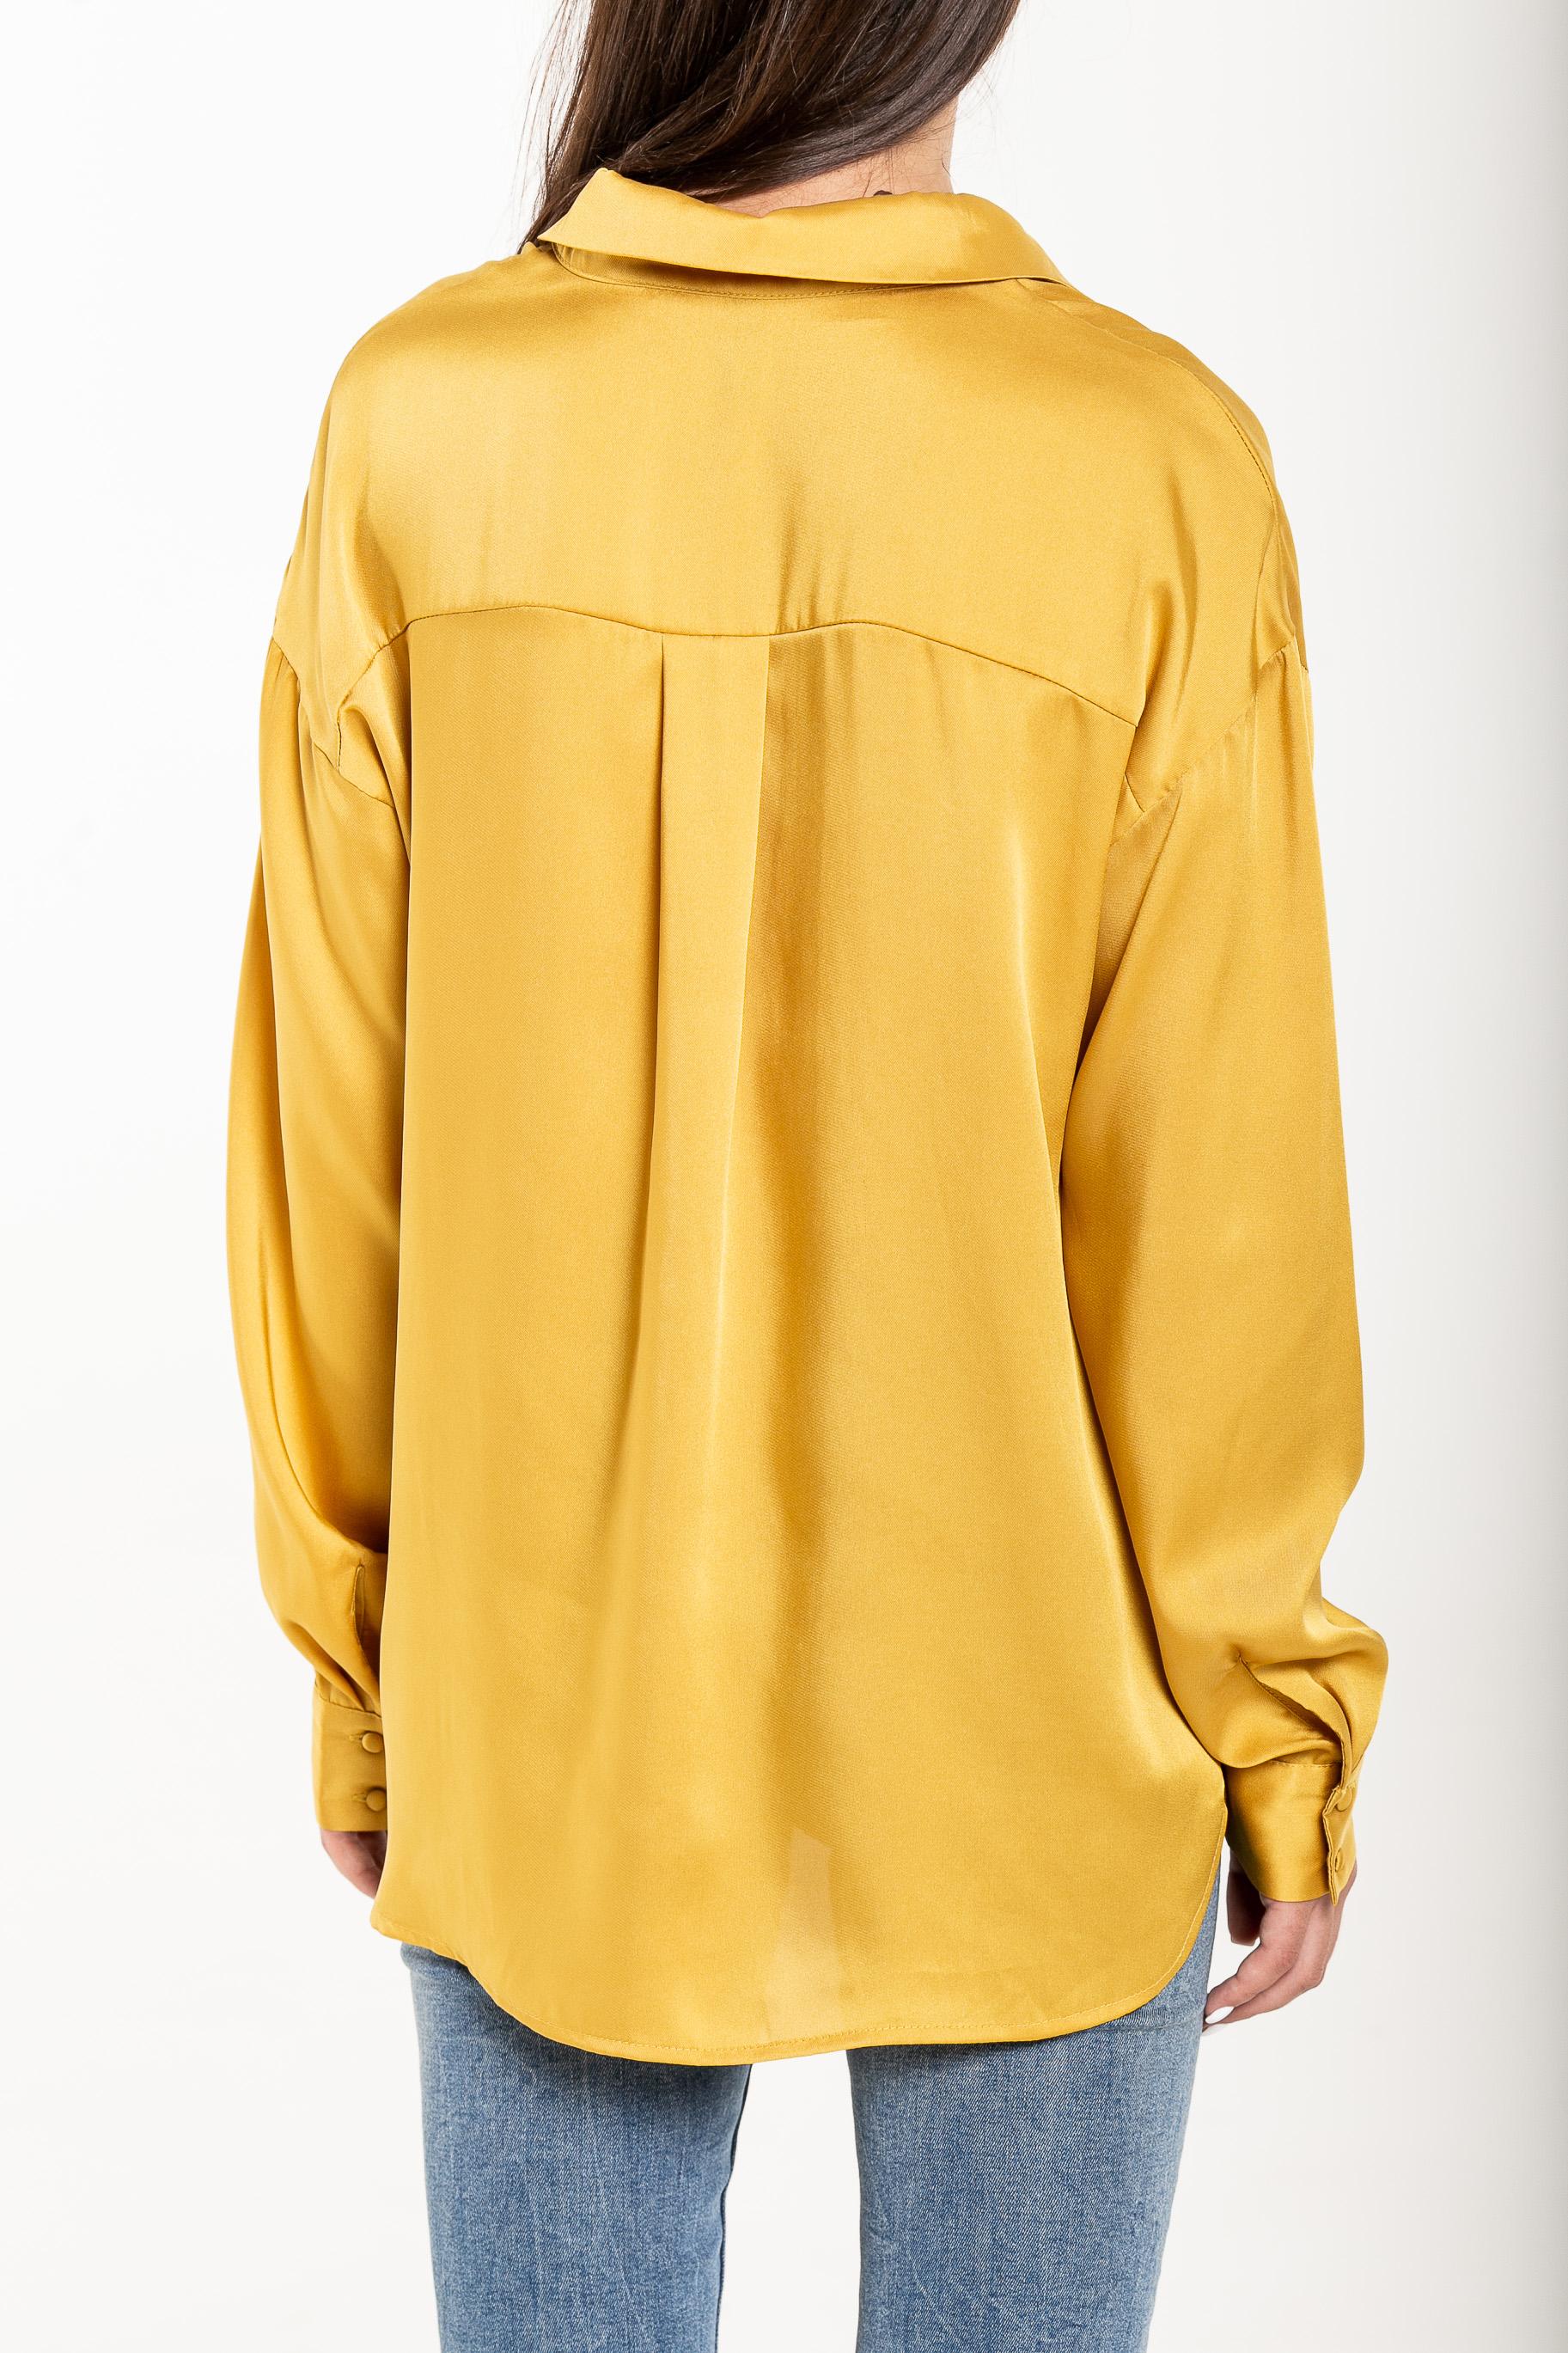 Блузка Vero Moda Casual (1322) photo 0